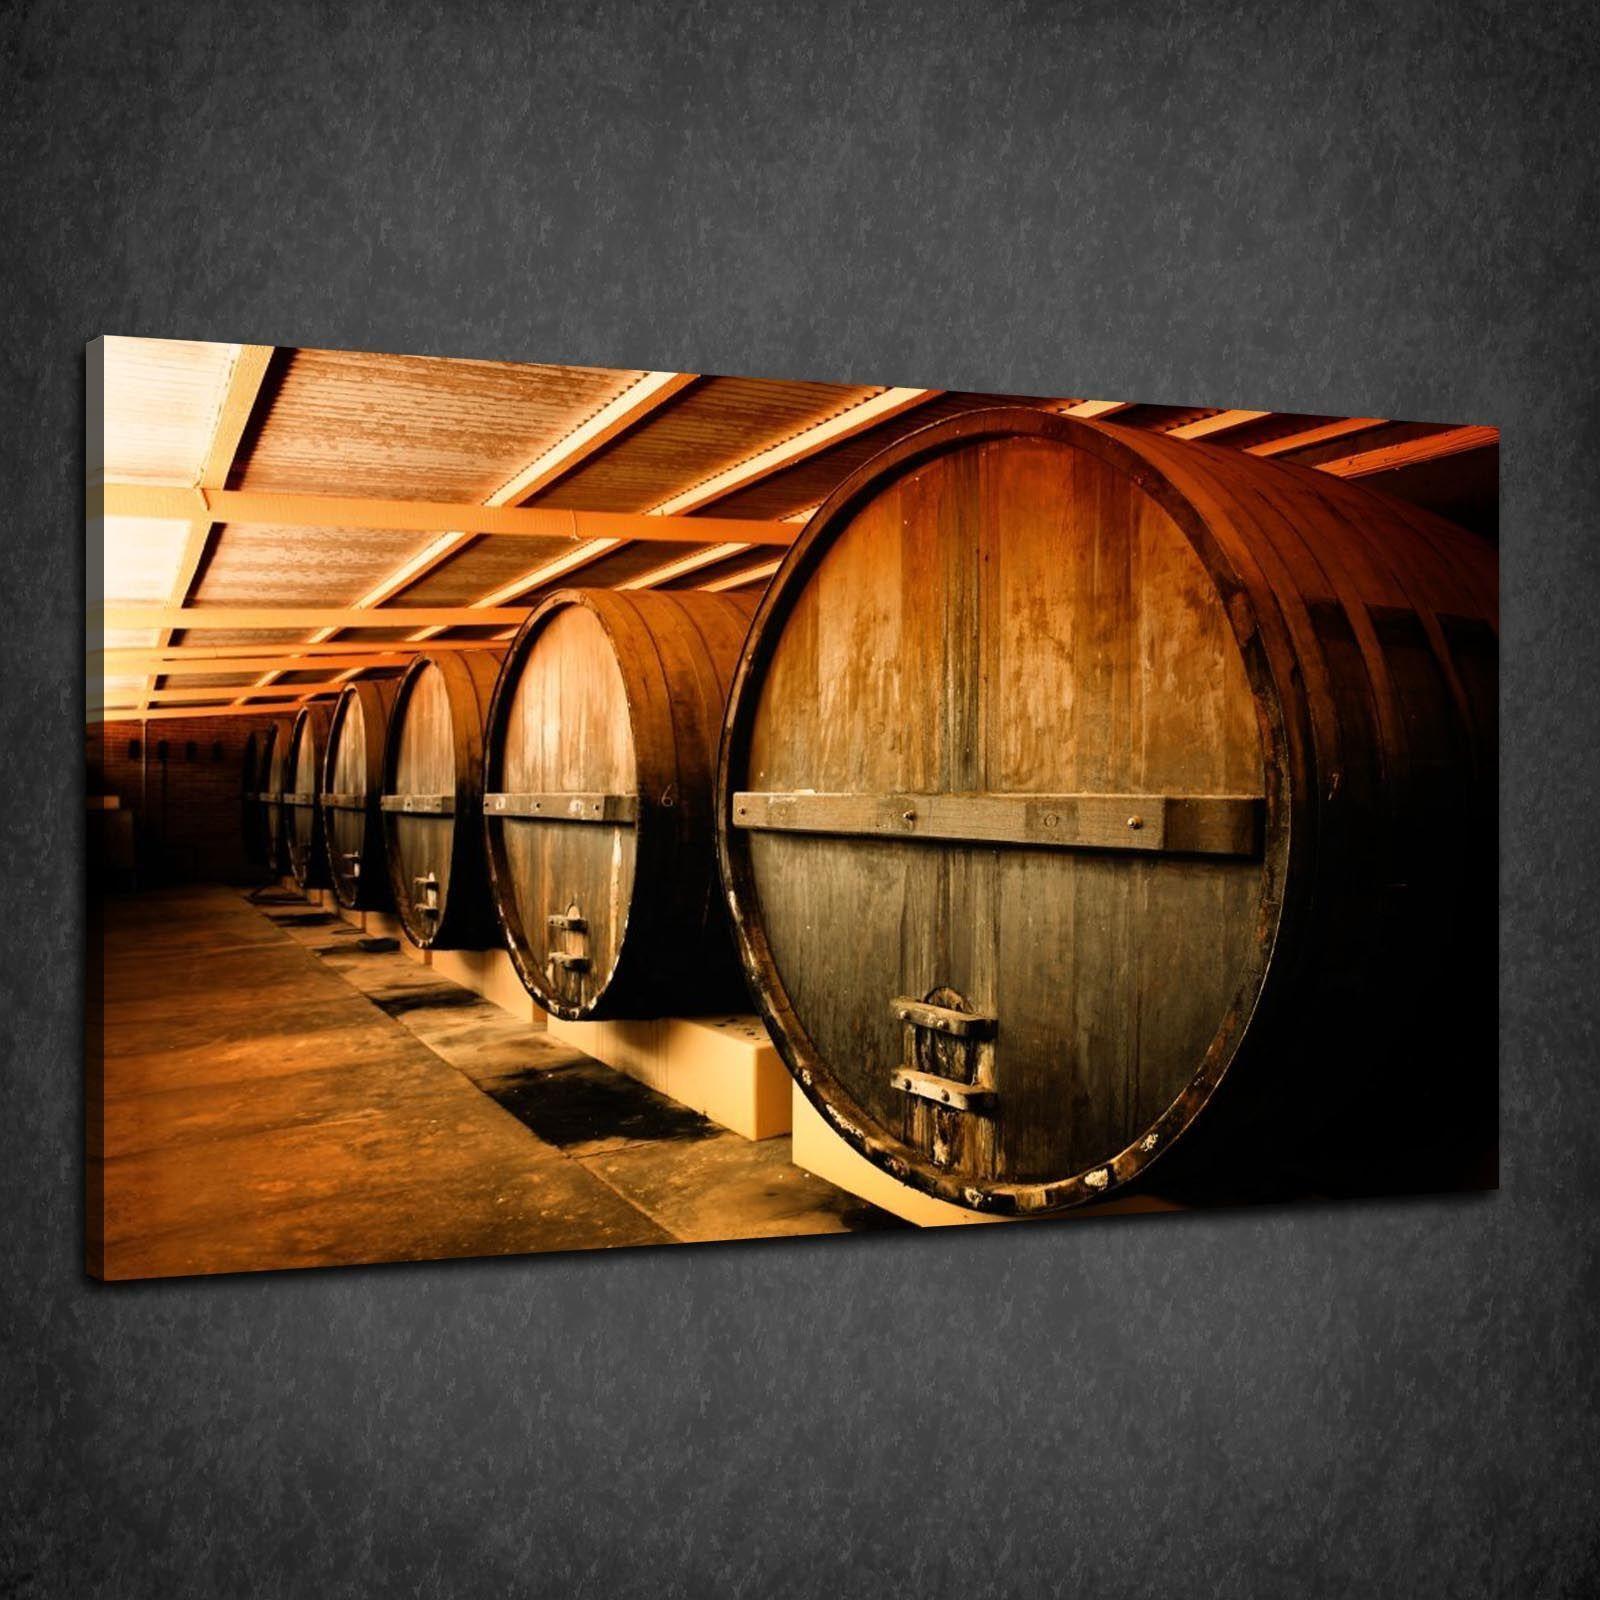 VINTAGE Winery BARILI Retrò Scatola Design Cucina Stampa Tela Wall Art Picture